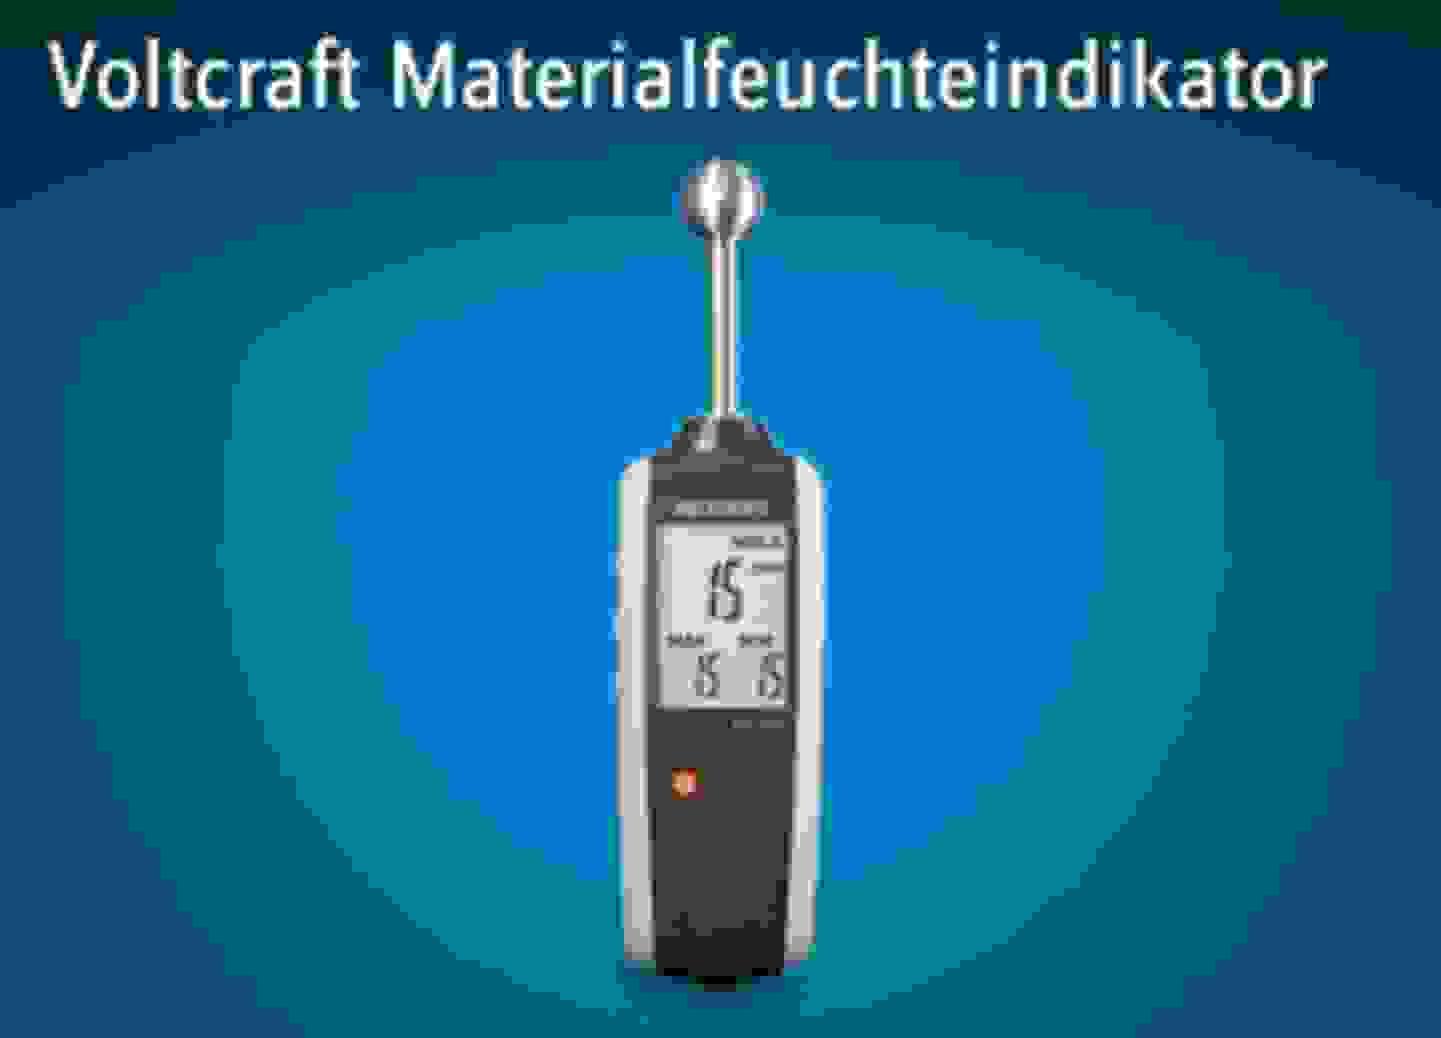 Voltcraft Materialfeuchteindikator